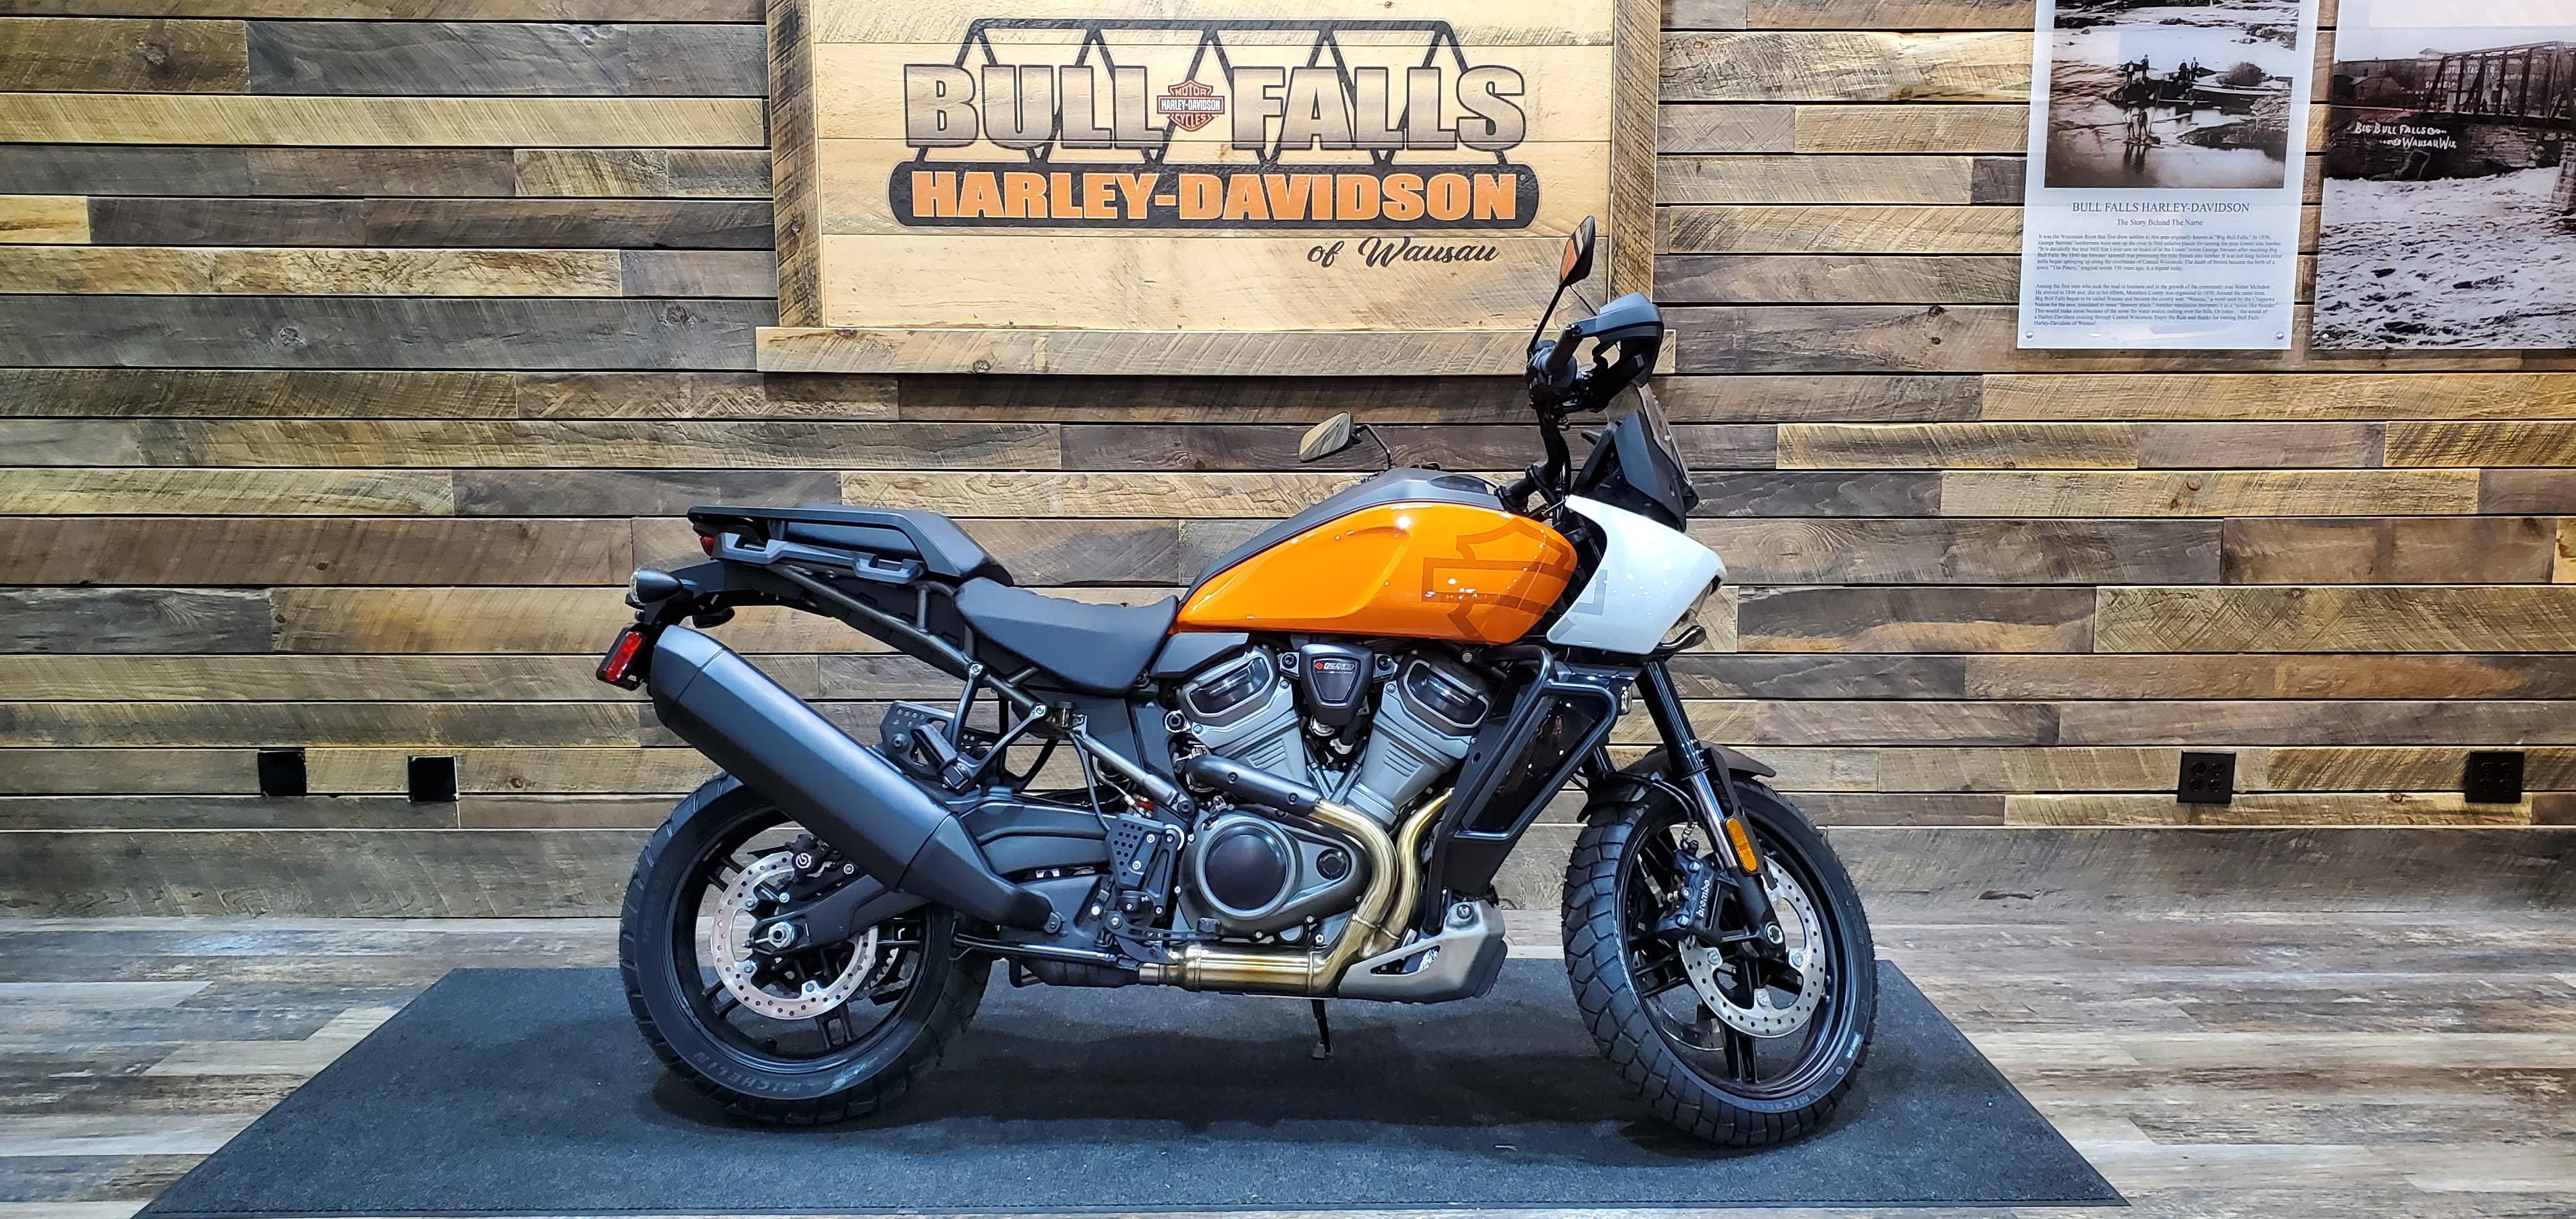 2021 Harley-Davidson Adventure Touring Pan America 1250 Special at Bull Falls Harley-Davidson